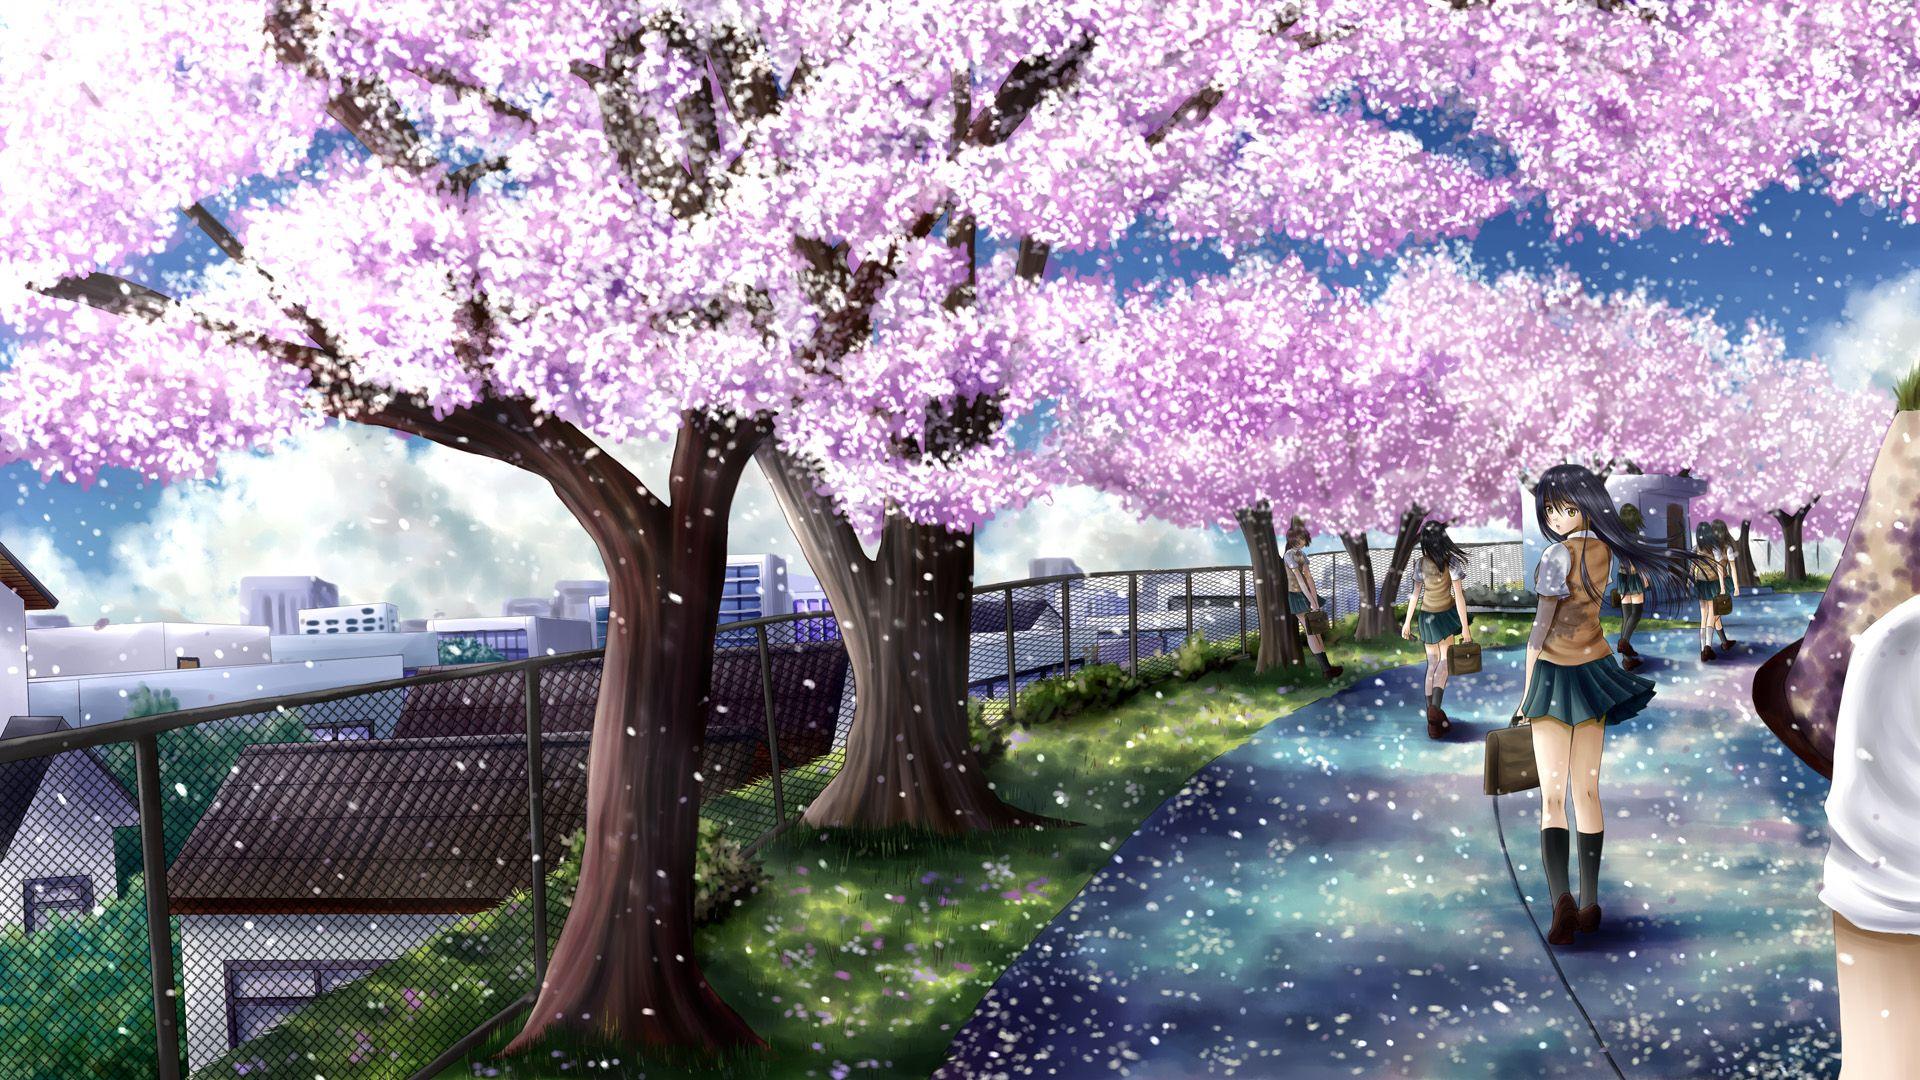 cherry blossoms, ilolamai, seifuku.jpg (1920×1080)